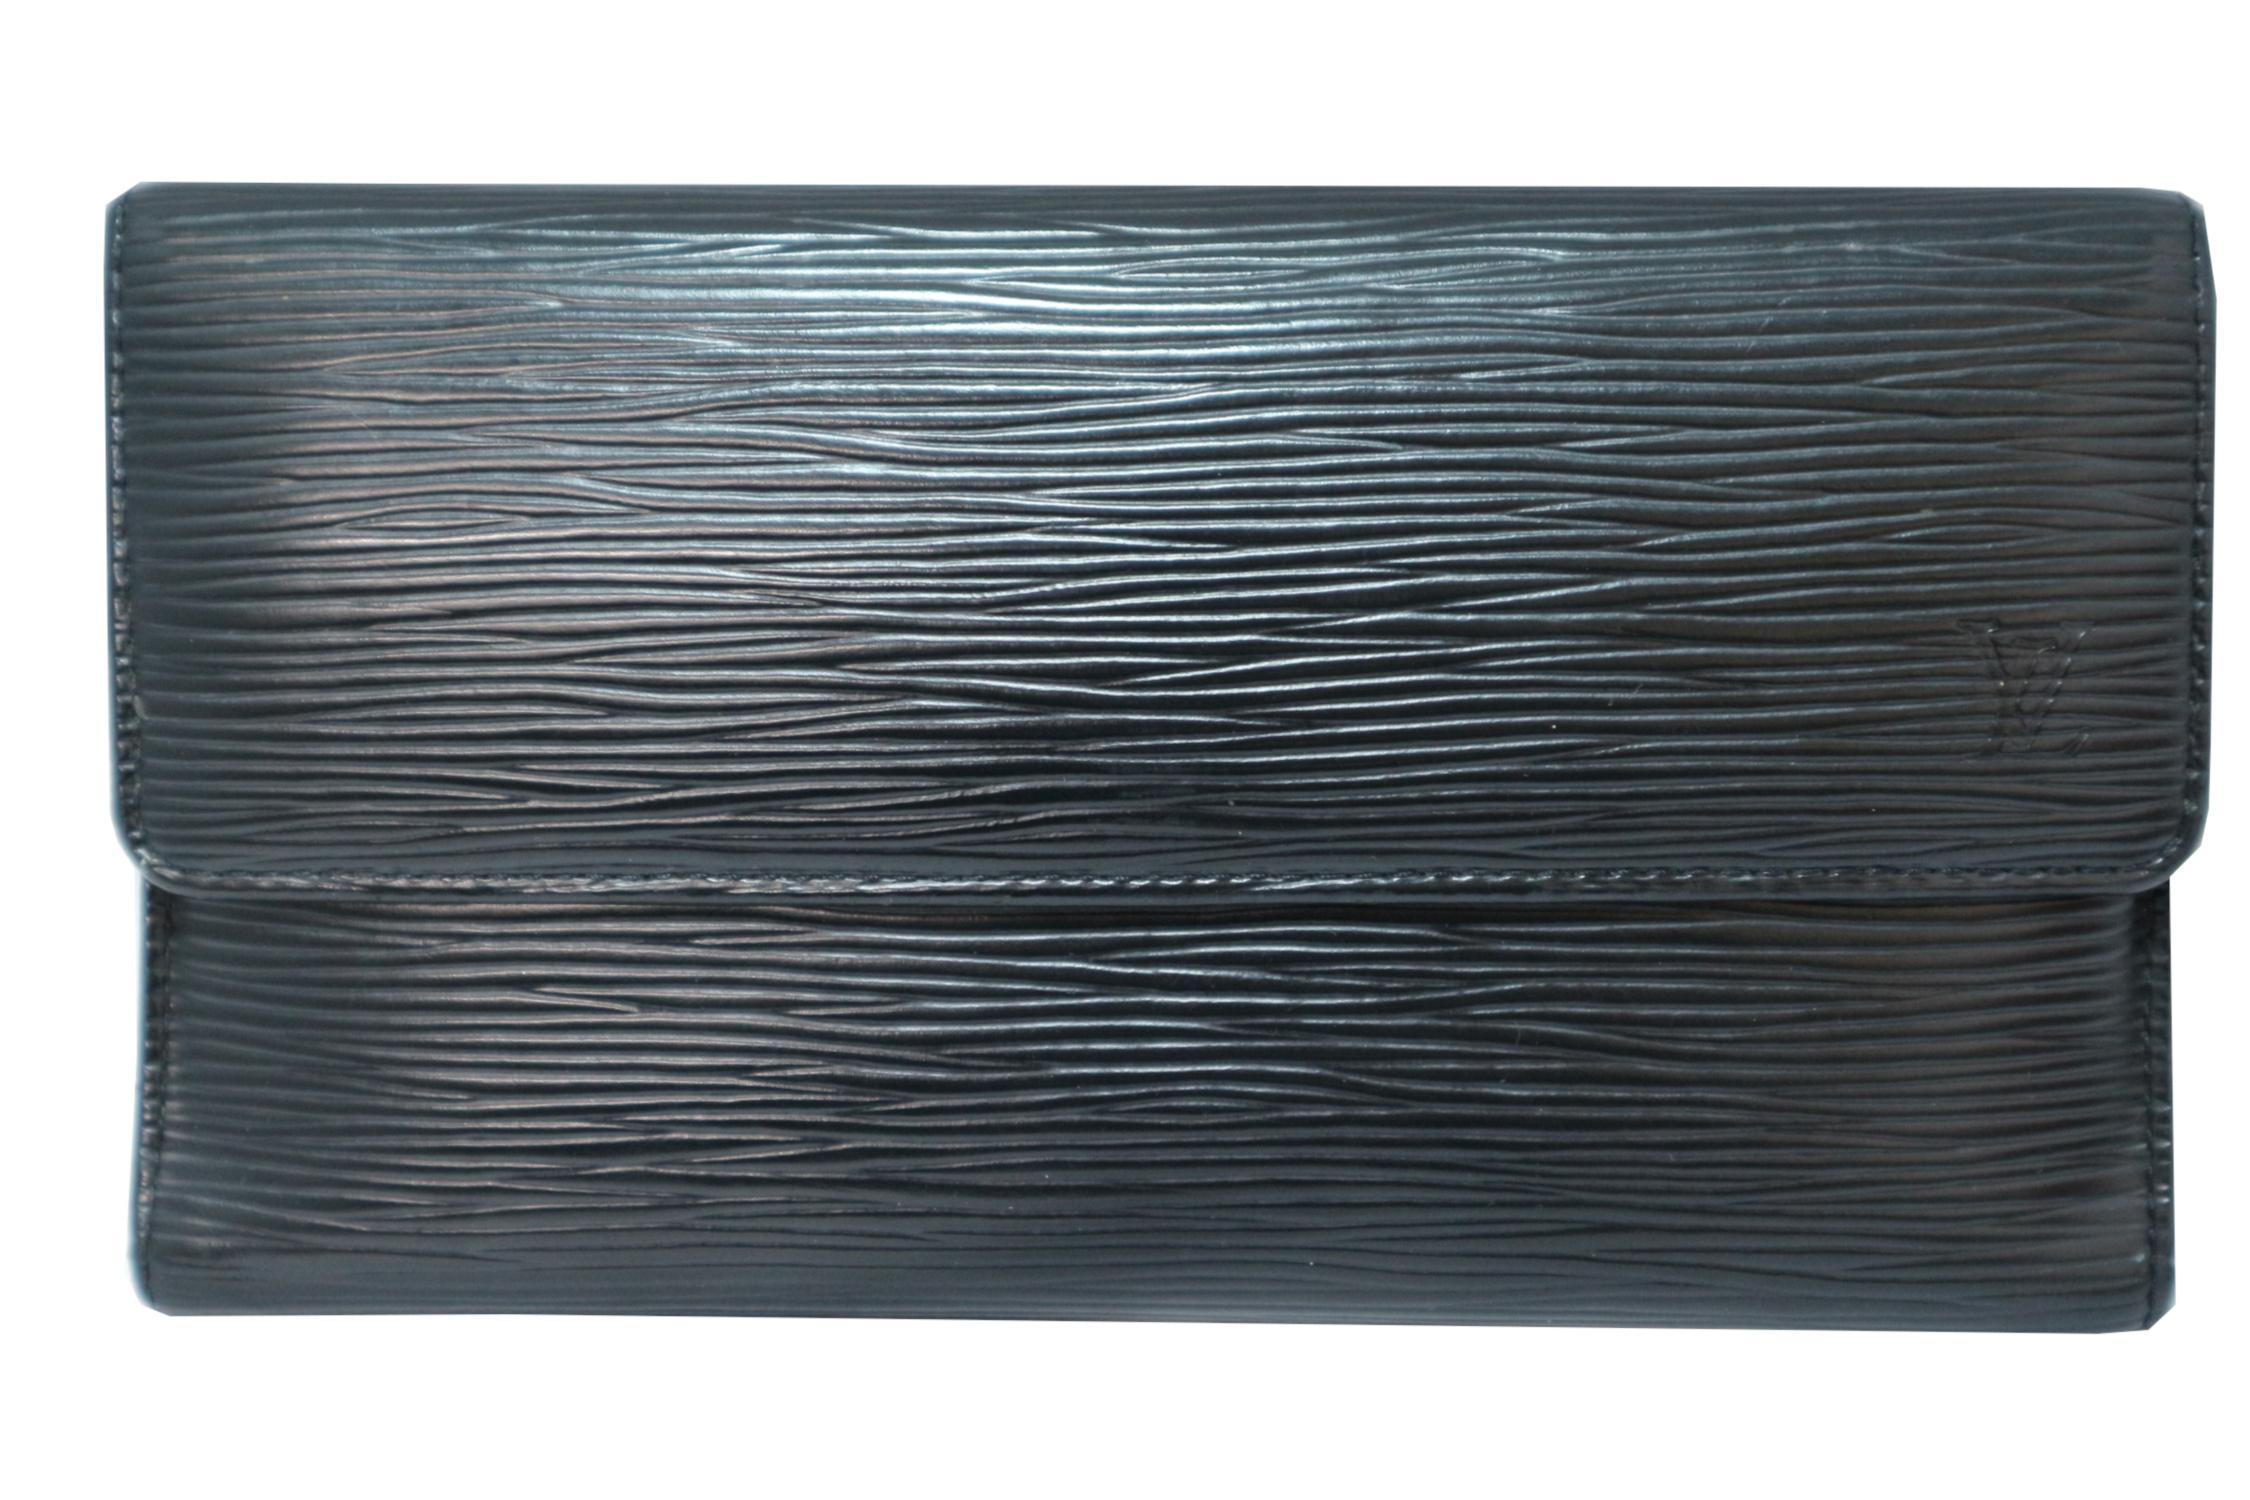 free shipping 7bdb6 87b66 [中古]LOUIS VUITTON(ルイ・ヴィトン)のメンズ 服飾小物 長財布